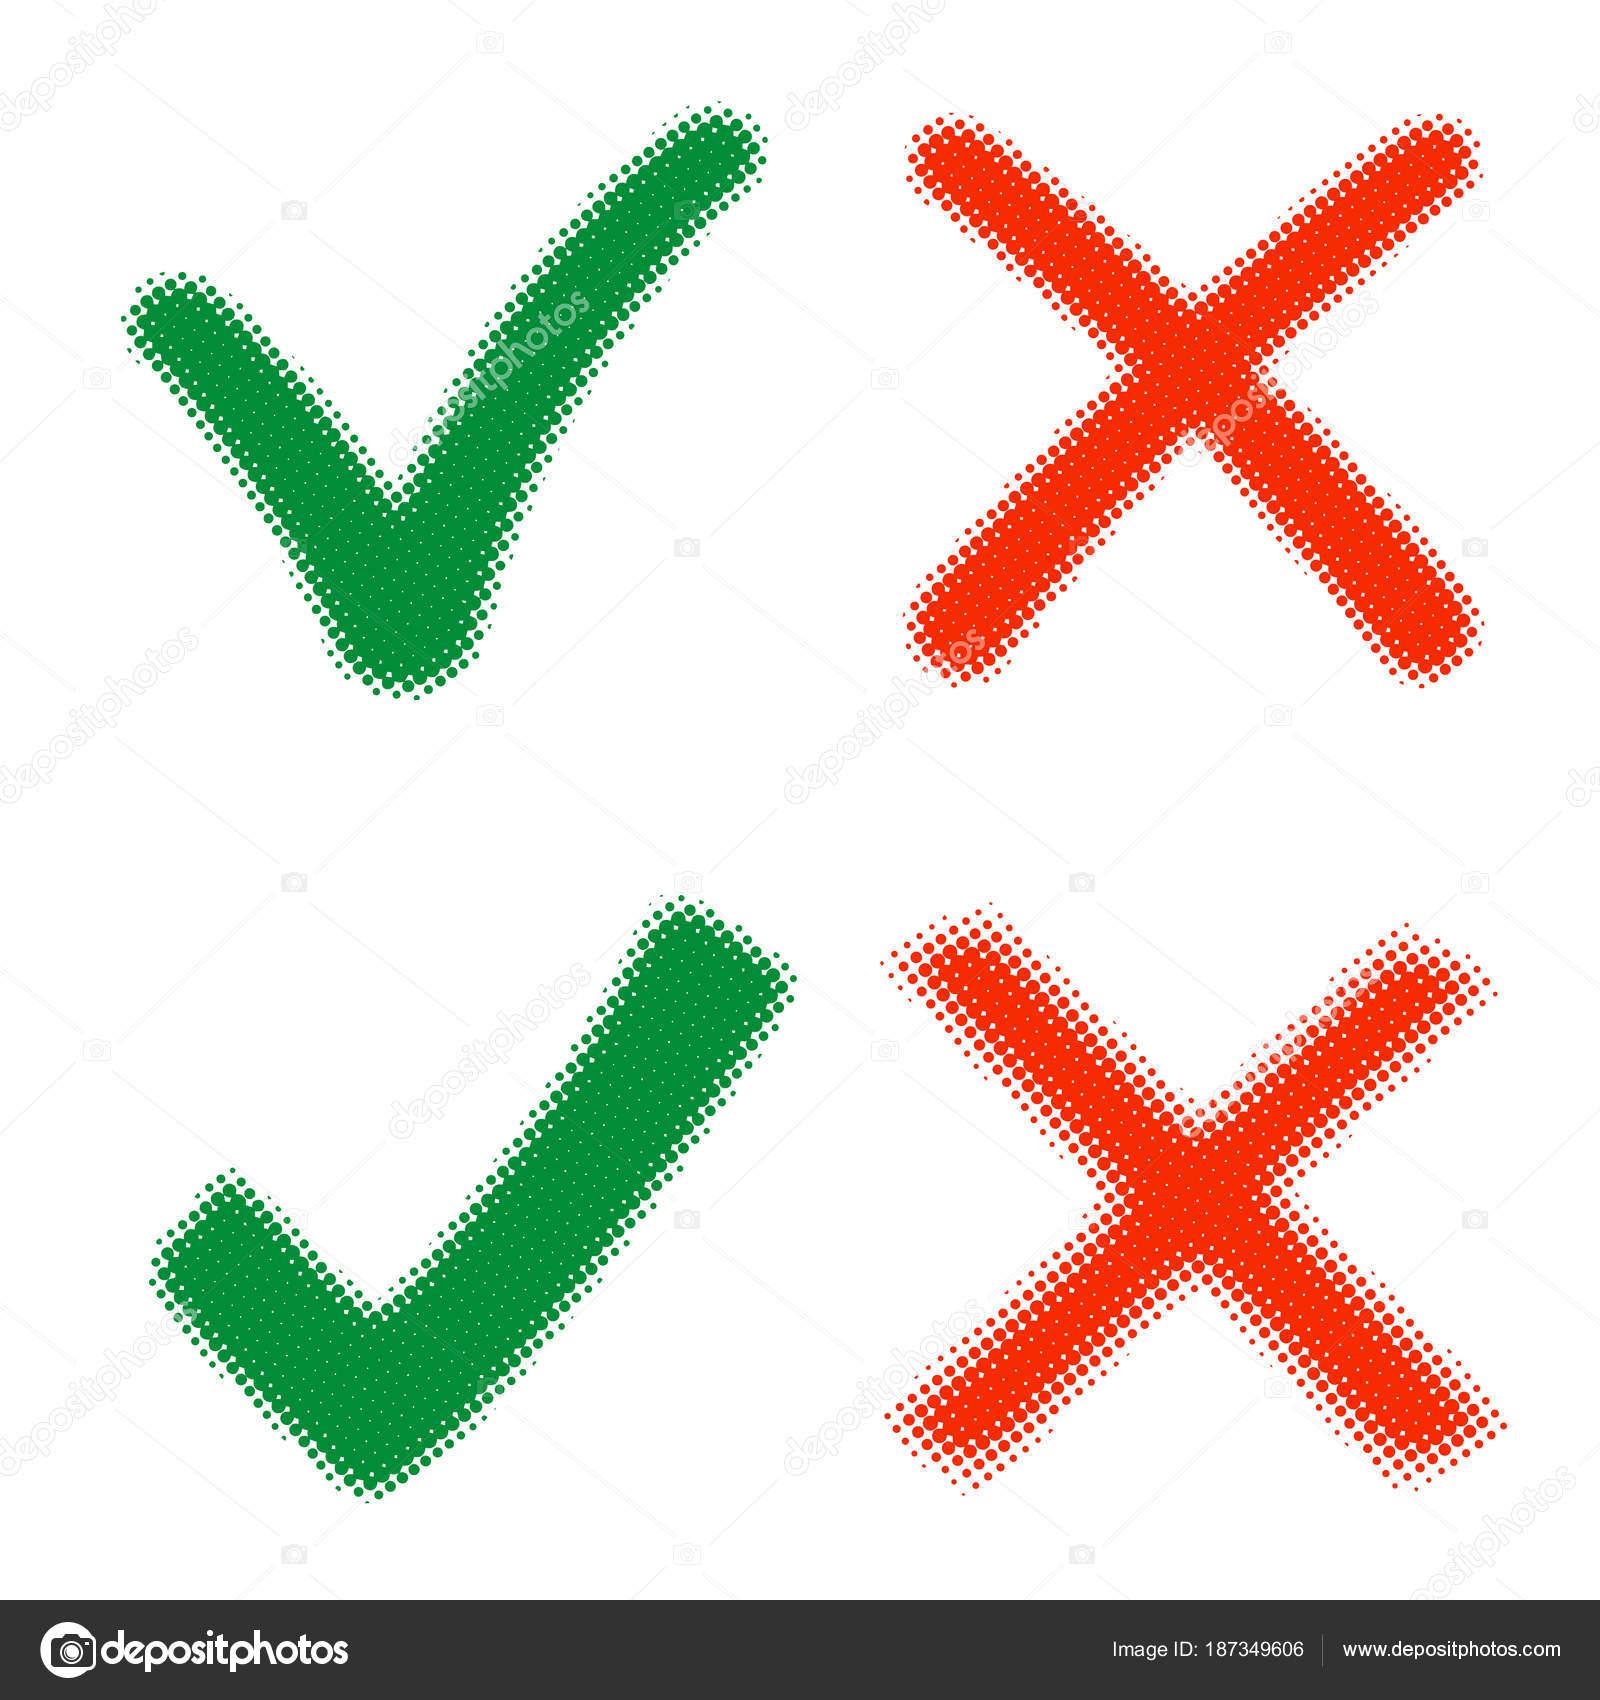 Mark X En V In Gekleurde Halftoon Groene Haken En Rode Kruizen Ja